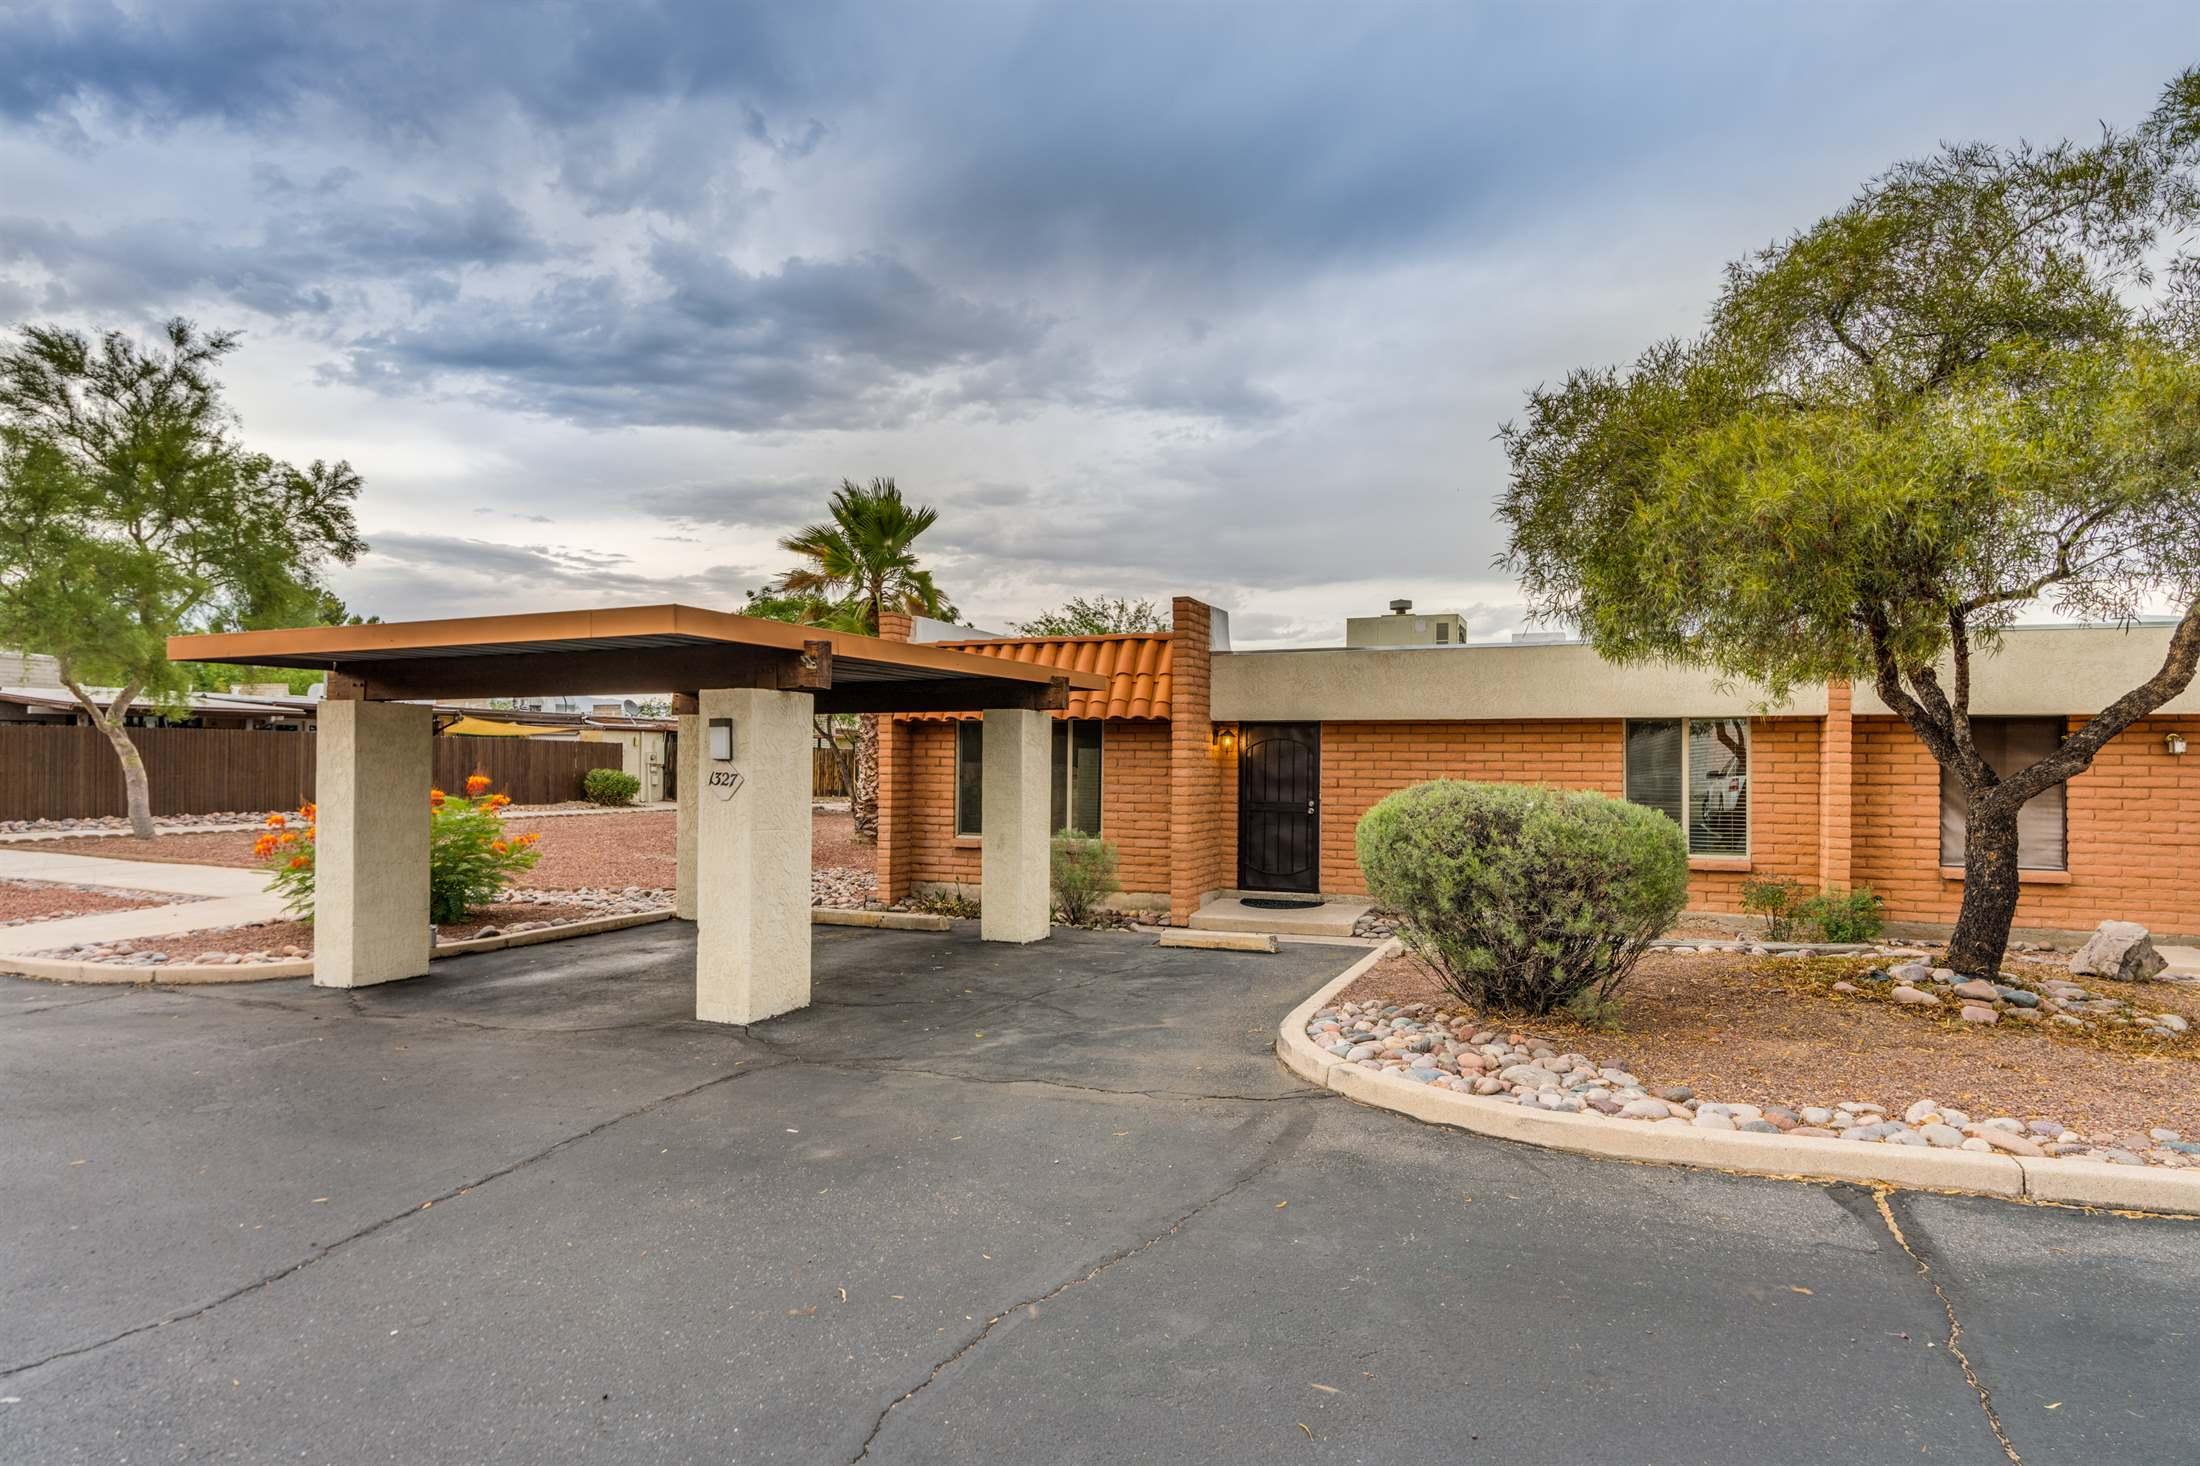 1327 S Wright Road, Tucson, AZ 85713